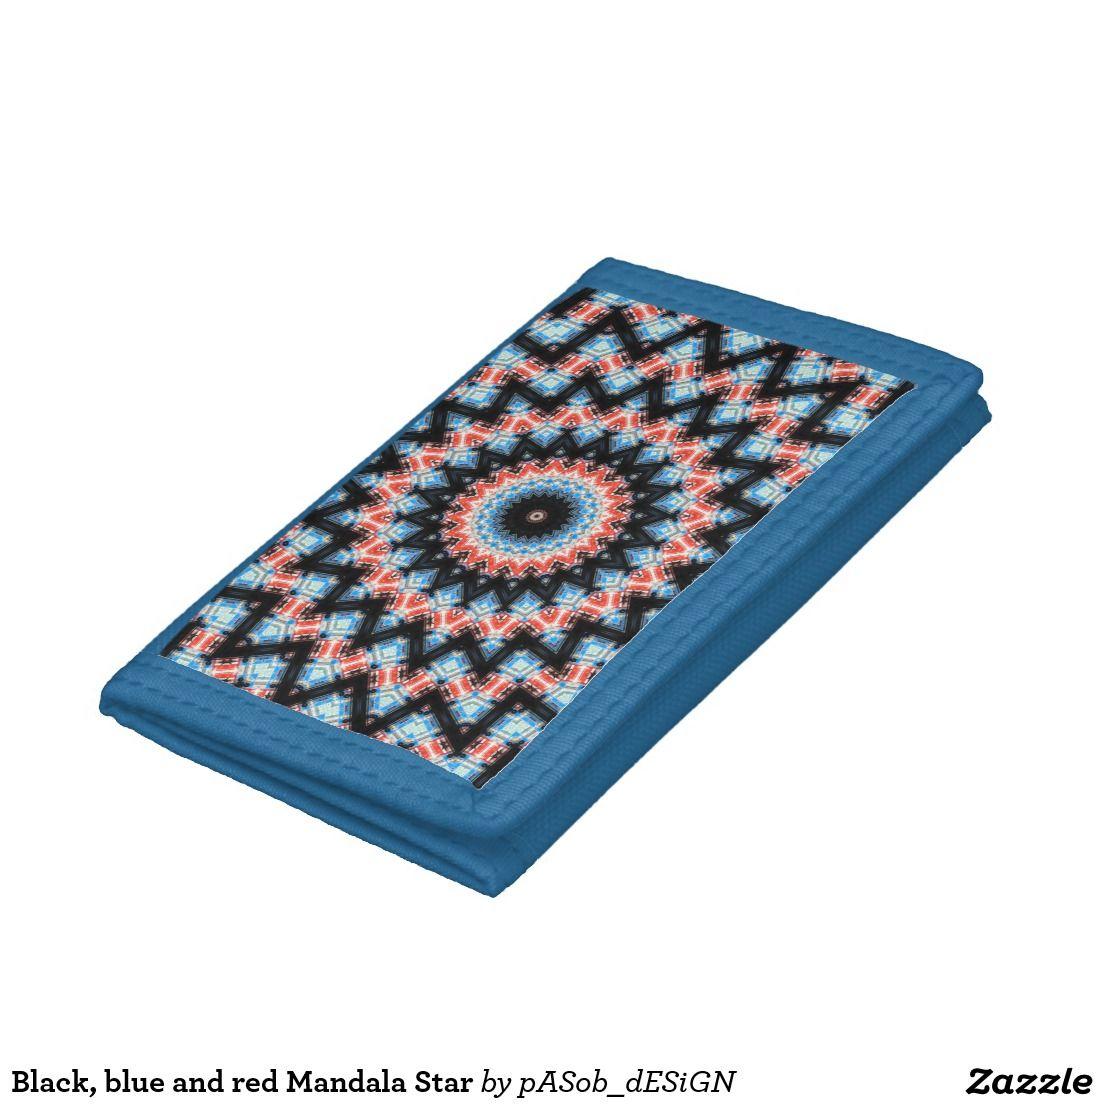 Black, blue and red Mandala Star